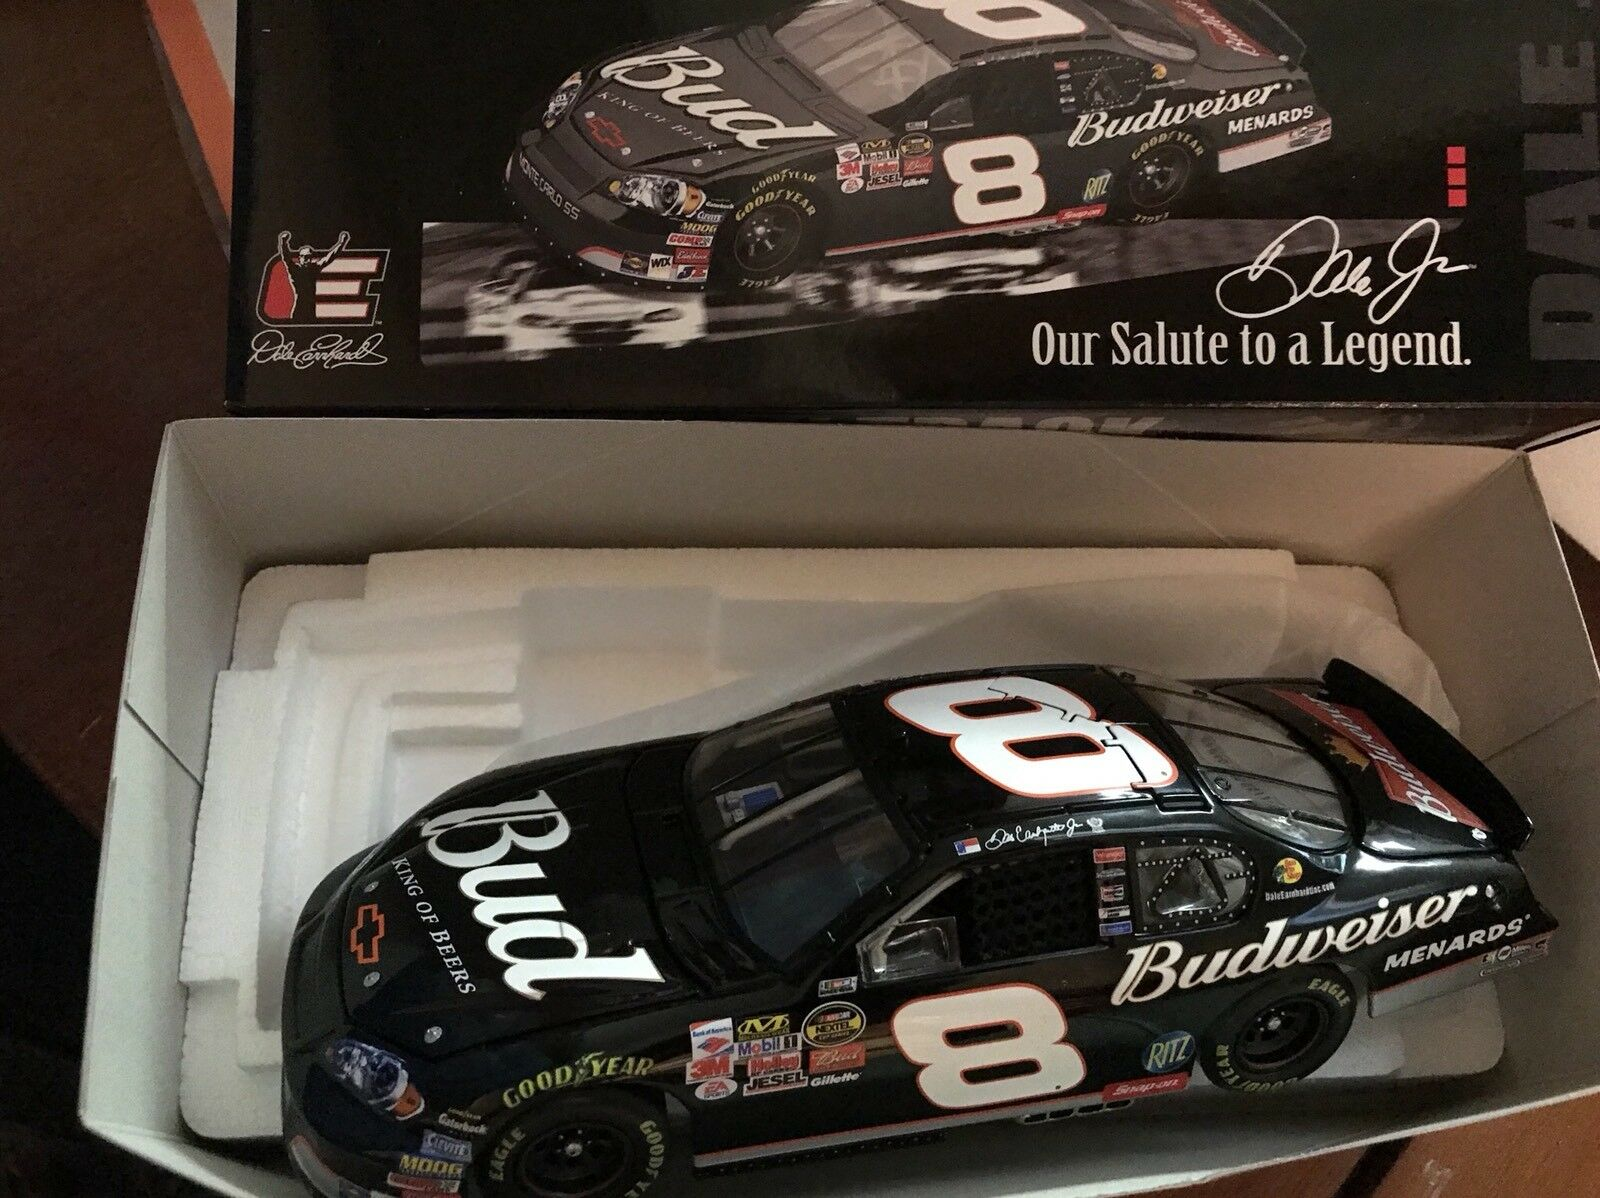 Dale Earnhardt Jr Budweiser back on track 3 días Dale 2006 acción 1 24 nero